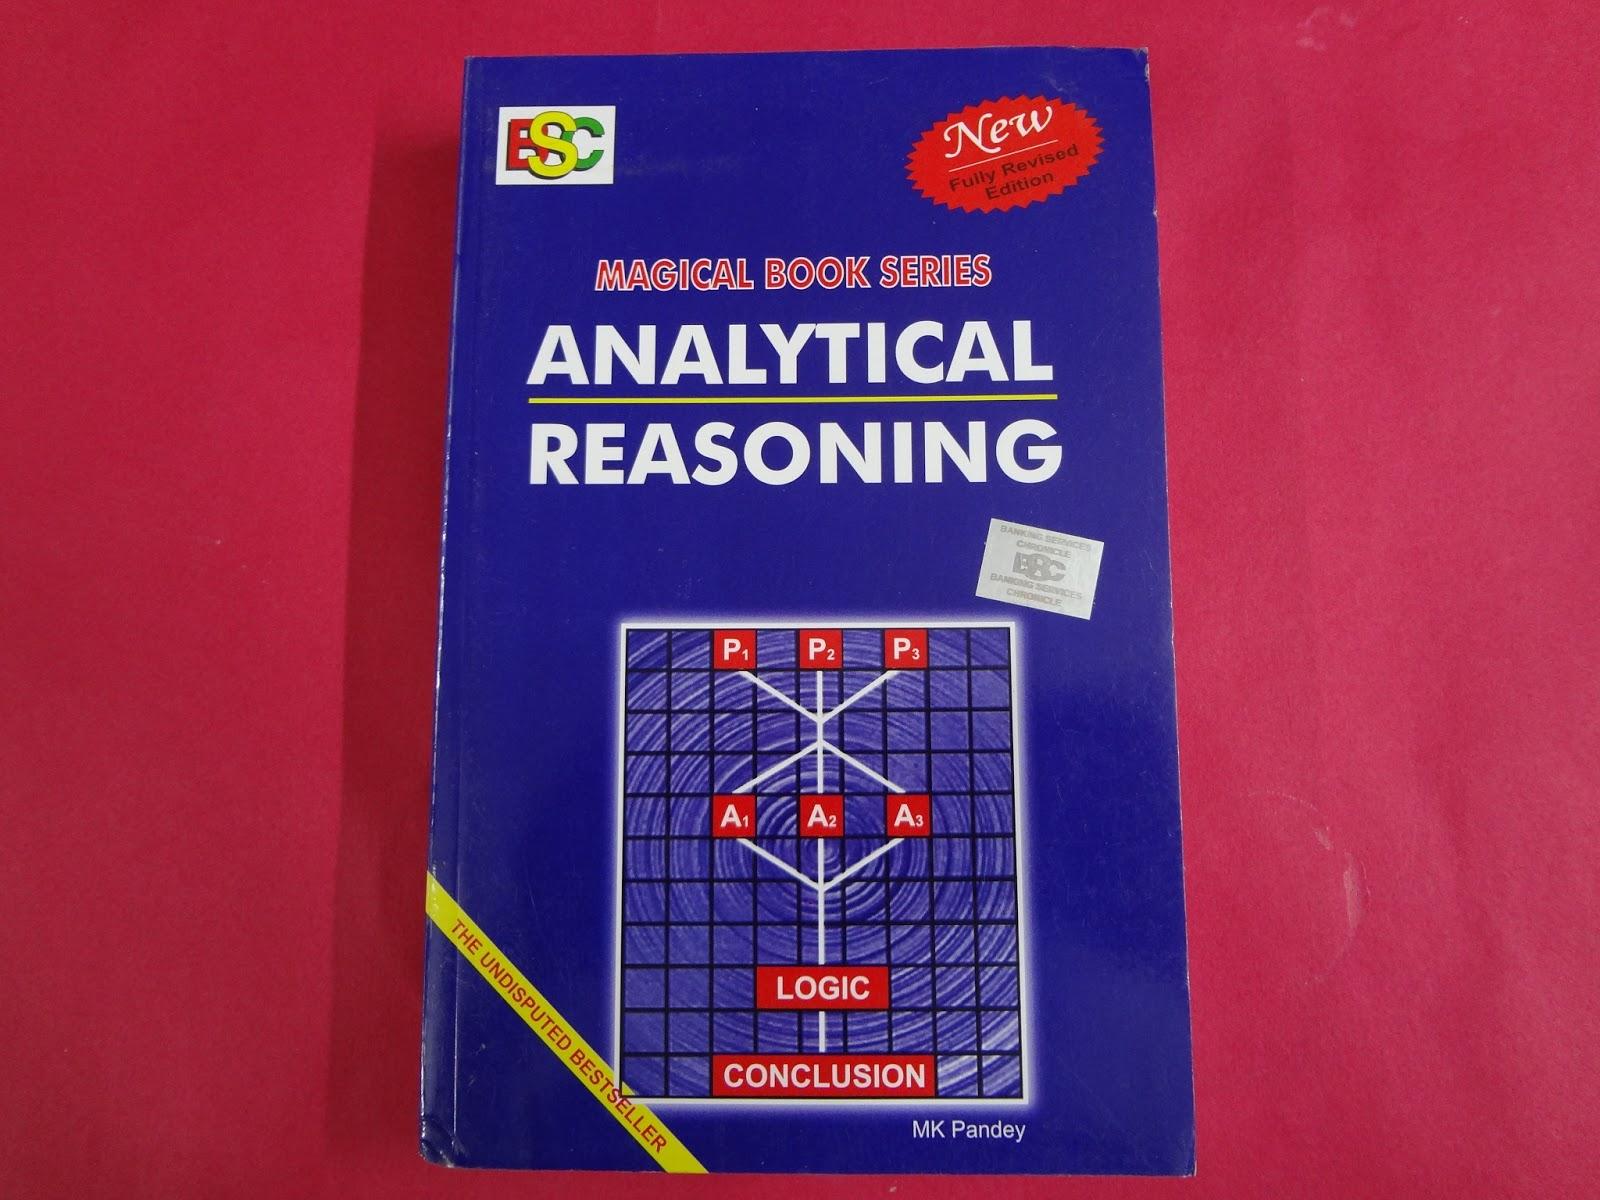 Reasoning rs pdf analytical aggarwal